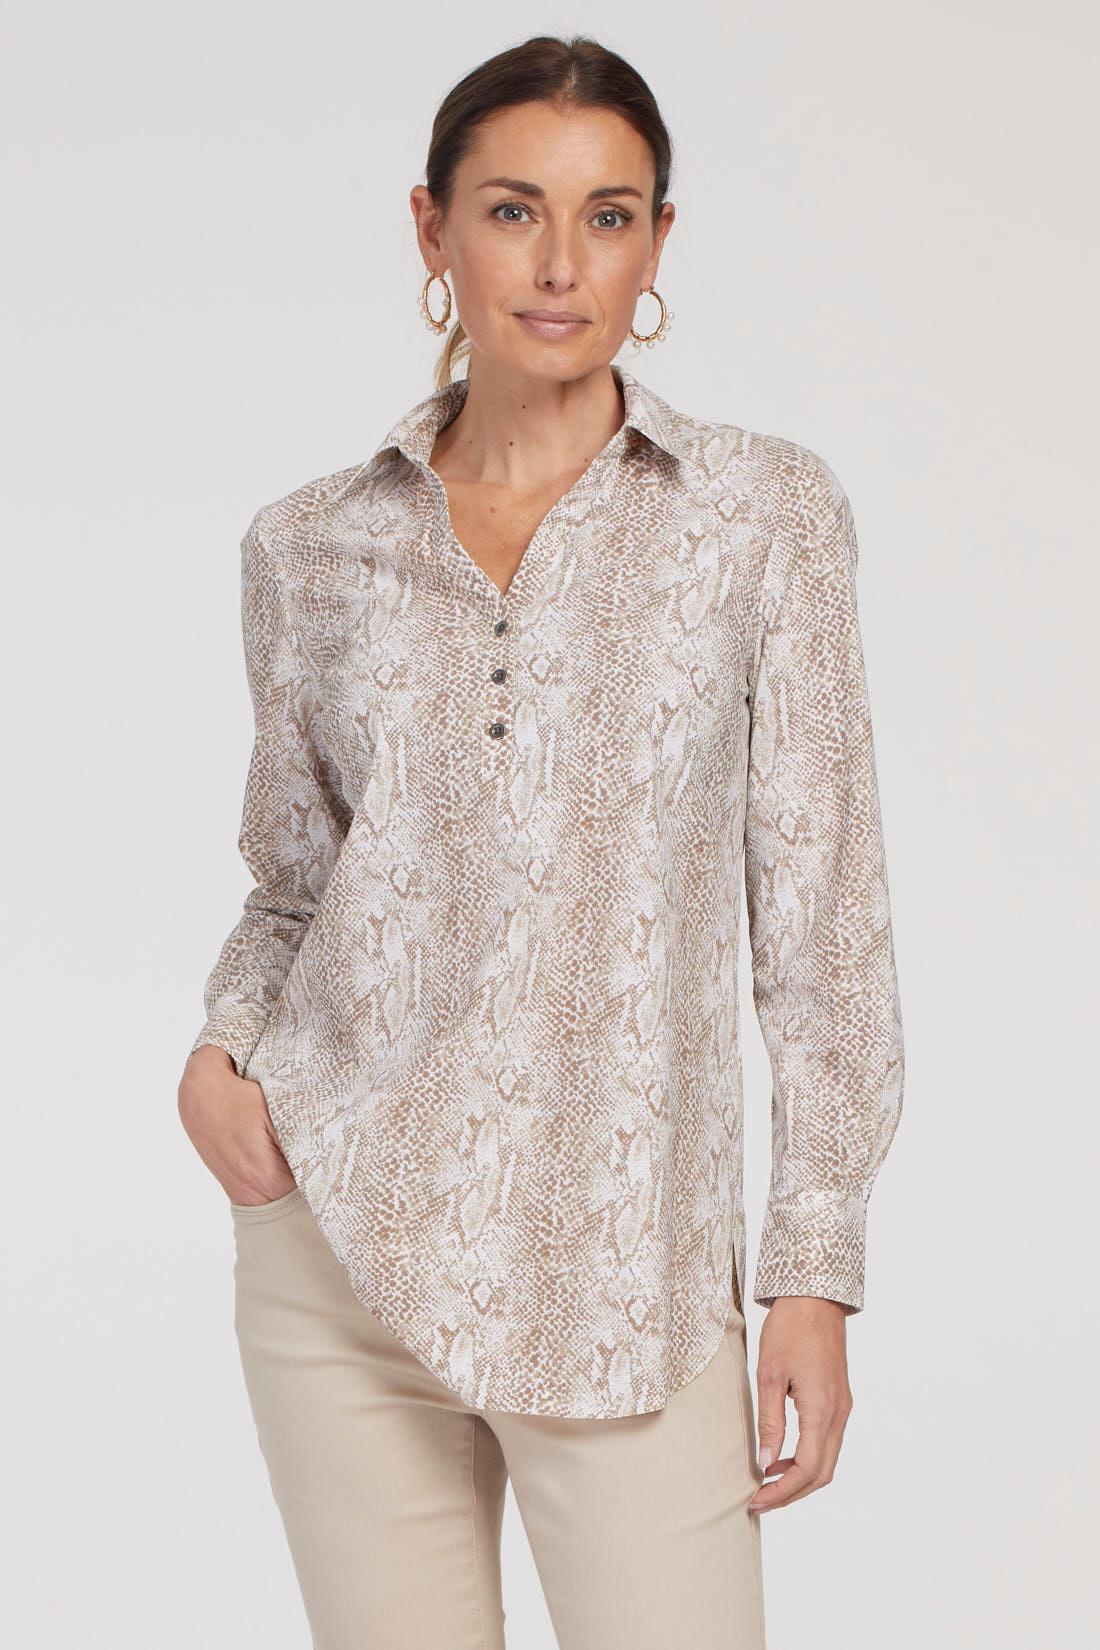 Long Sleeved Wrinkle Resistant Blouse